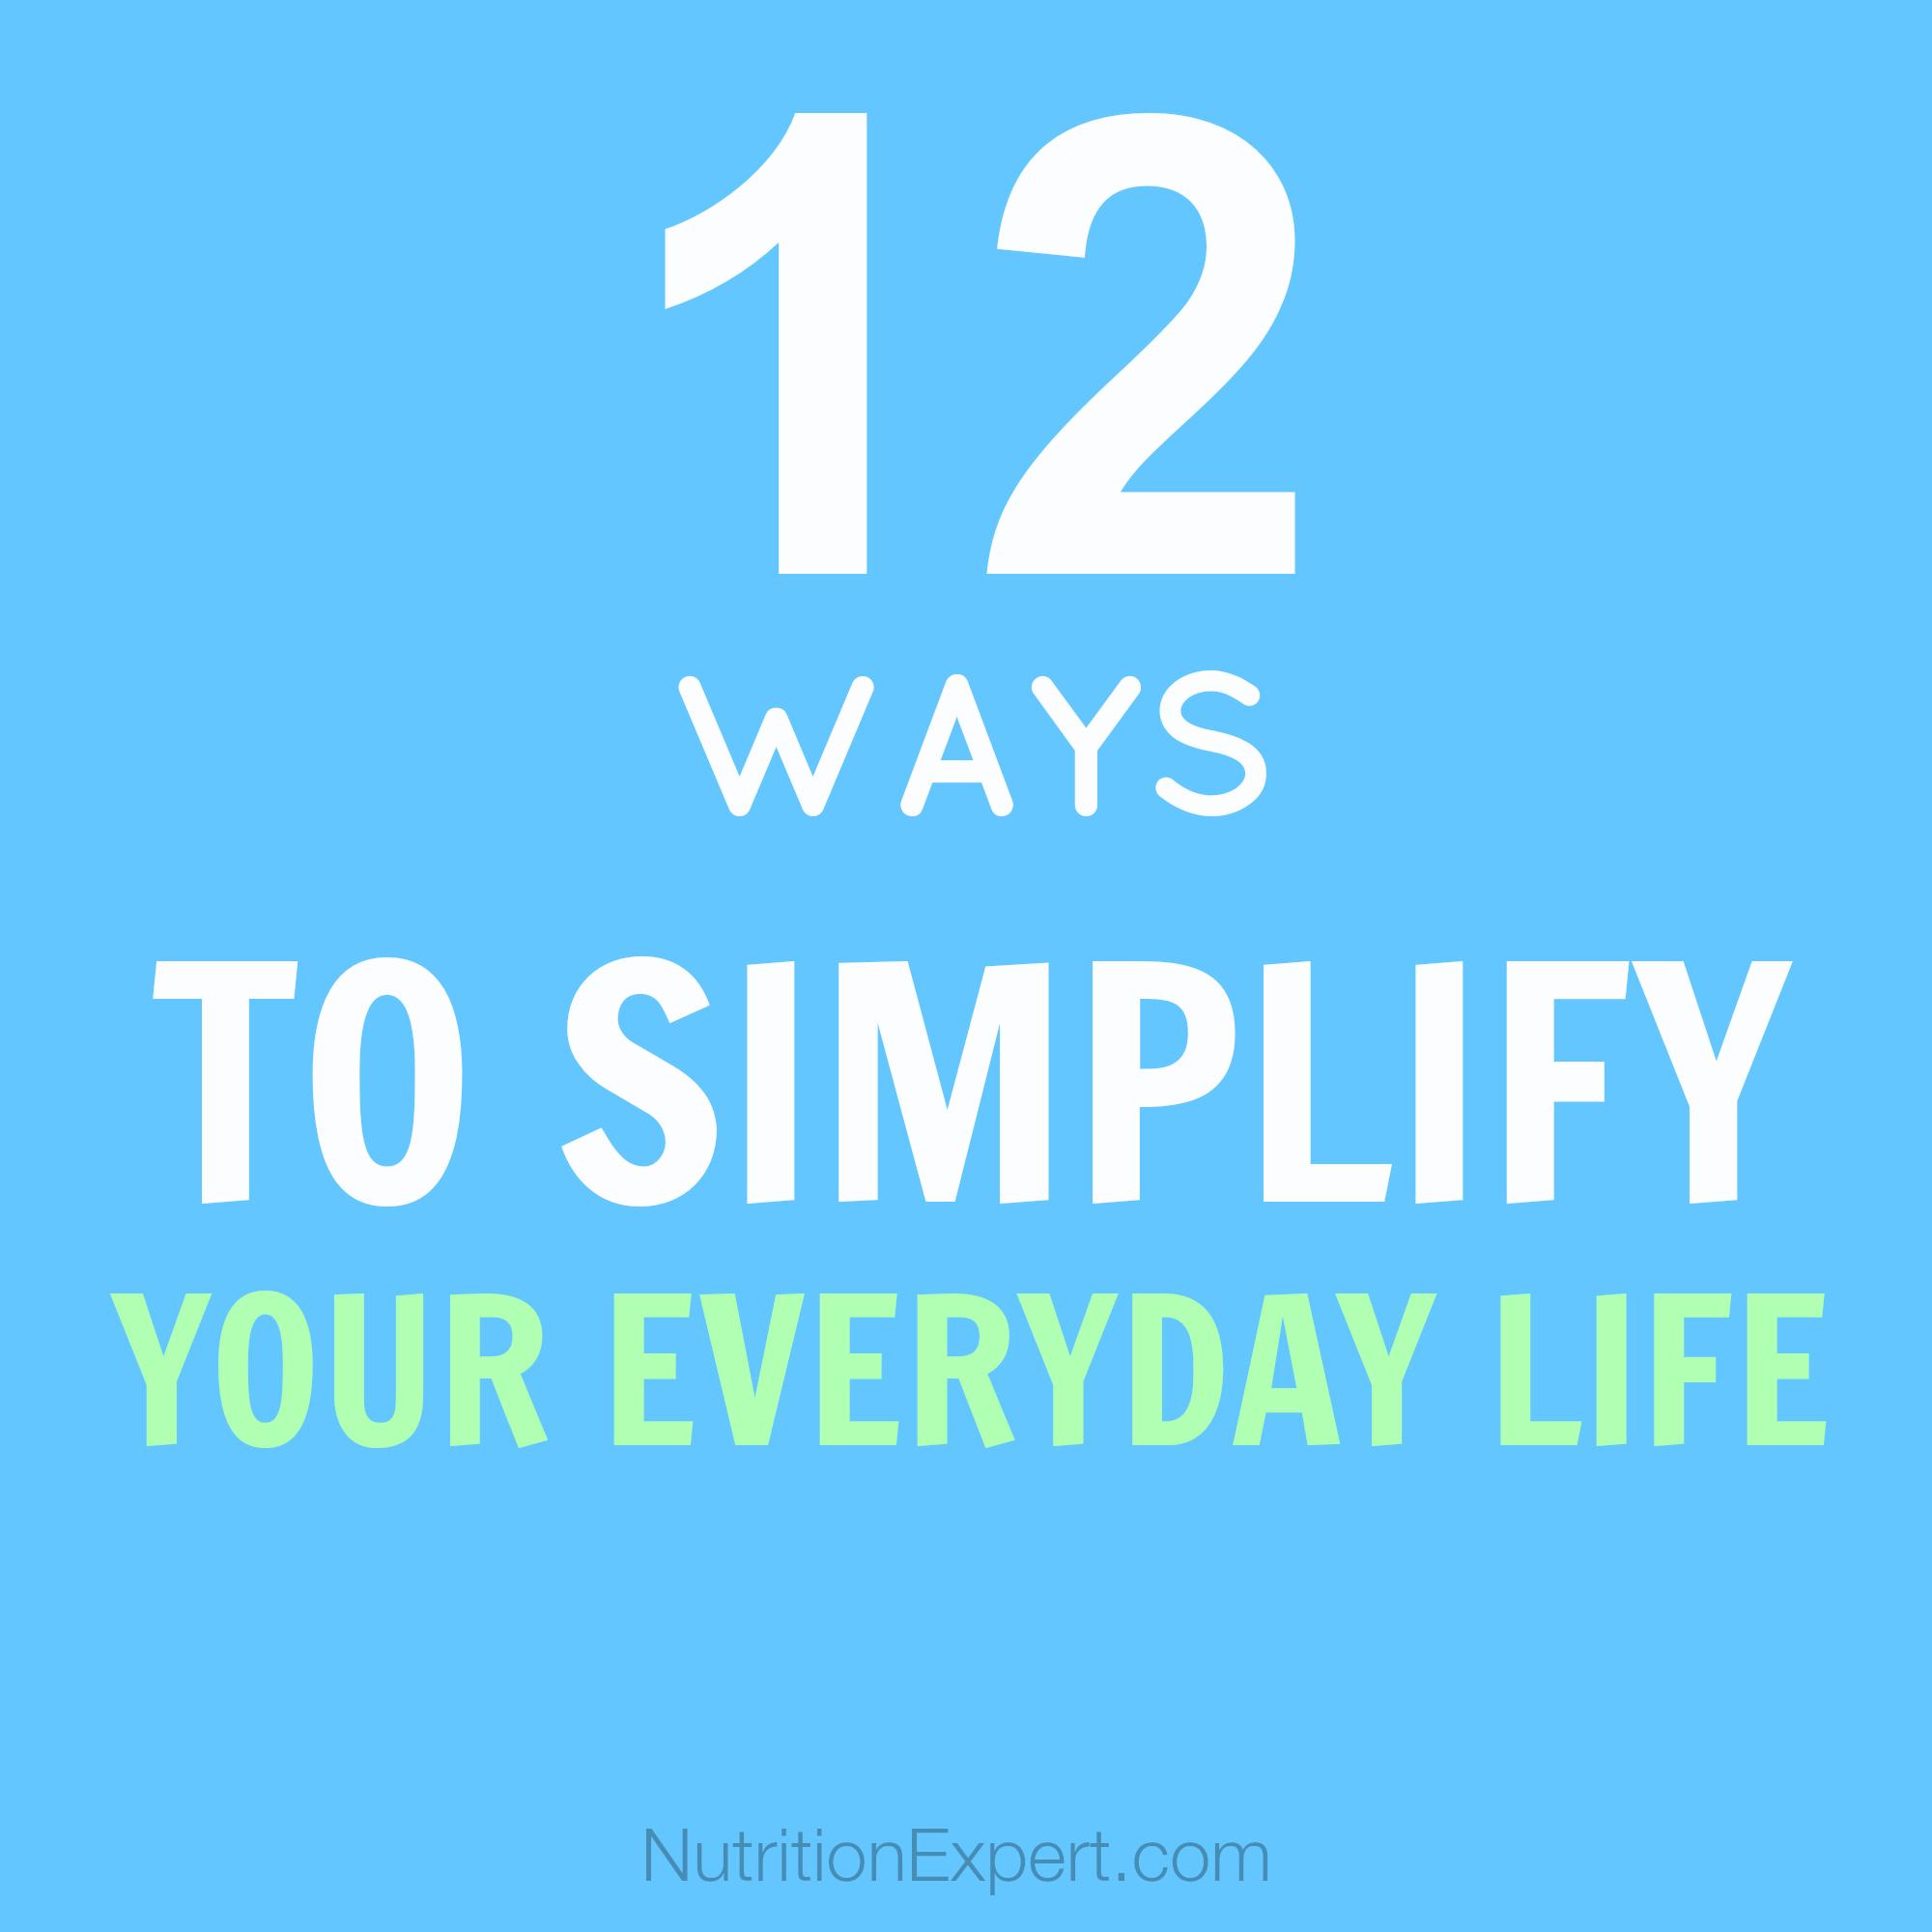 12 Ways to Simplify